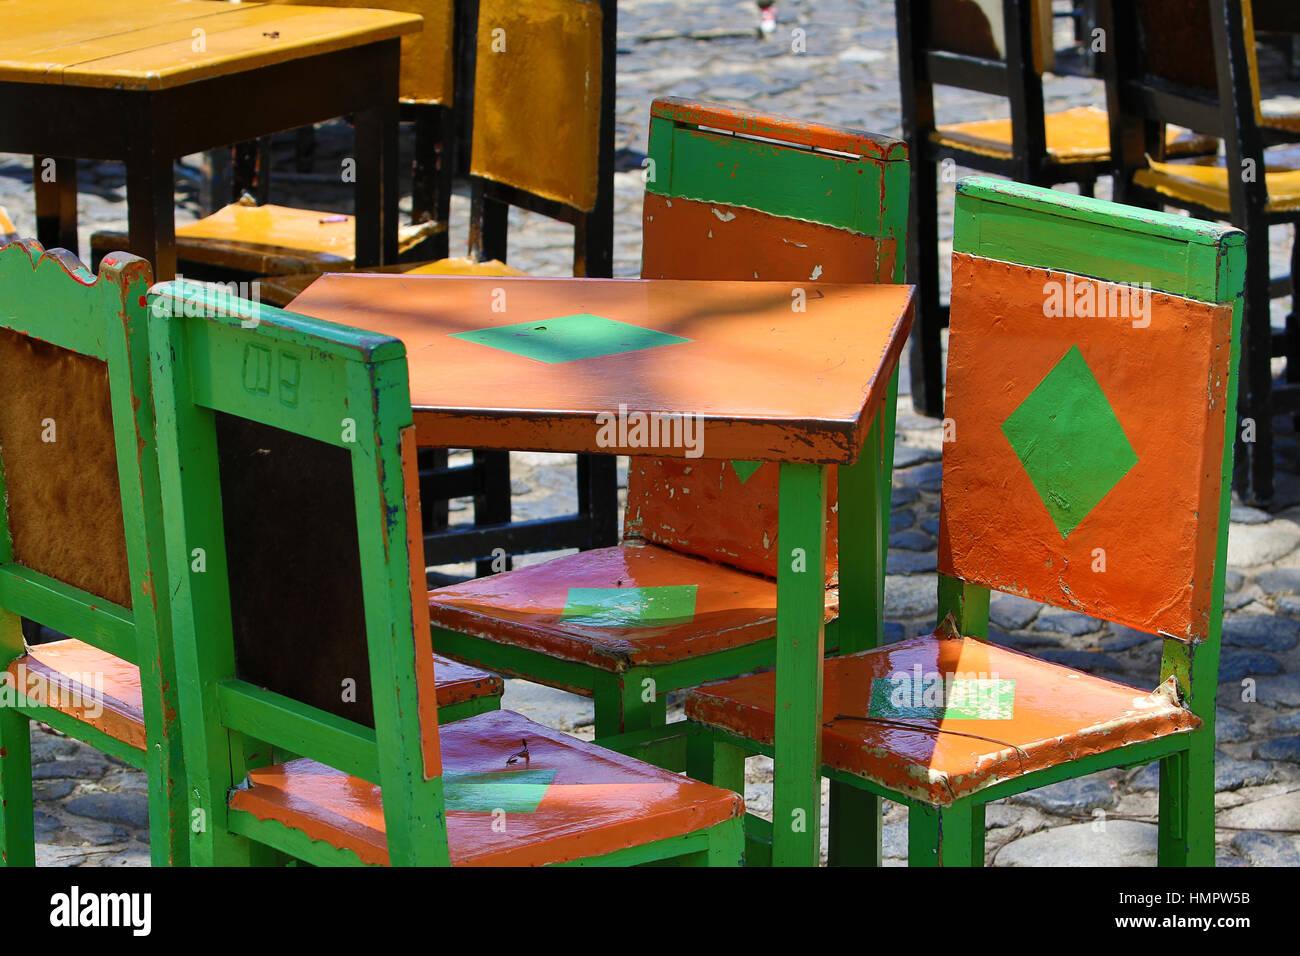 Travel Street Café Patio Tables And Chairs El Jardin Stock Photos ...